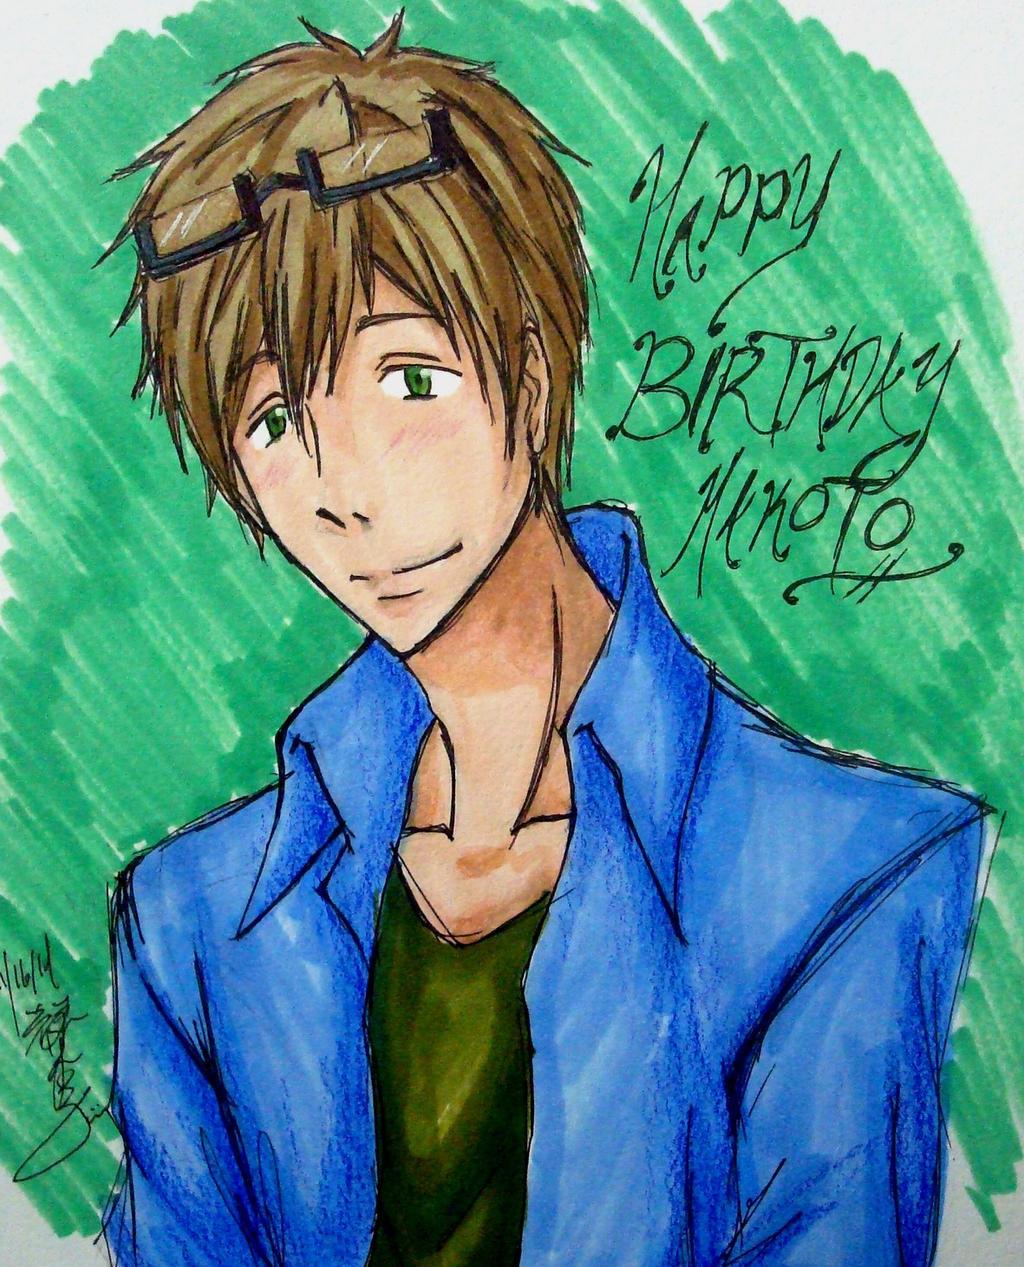 happy birthay makoto - photo #41